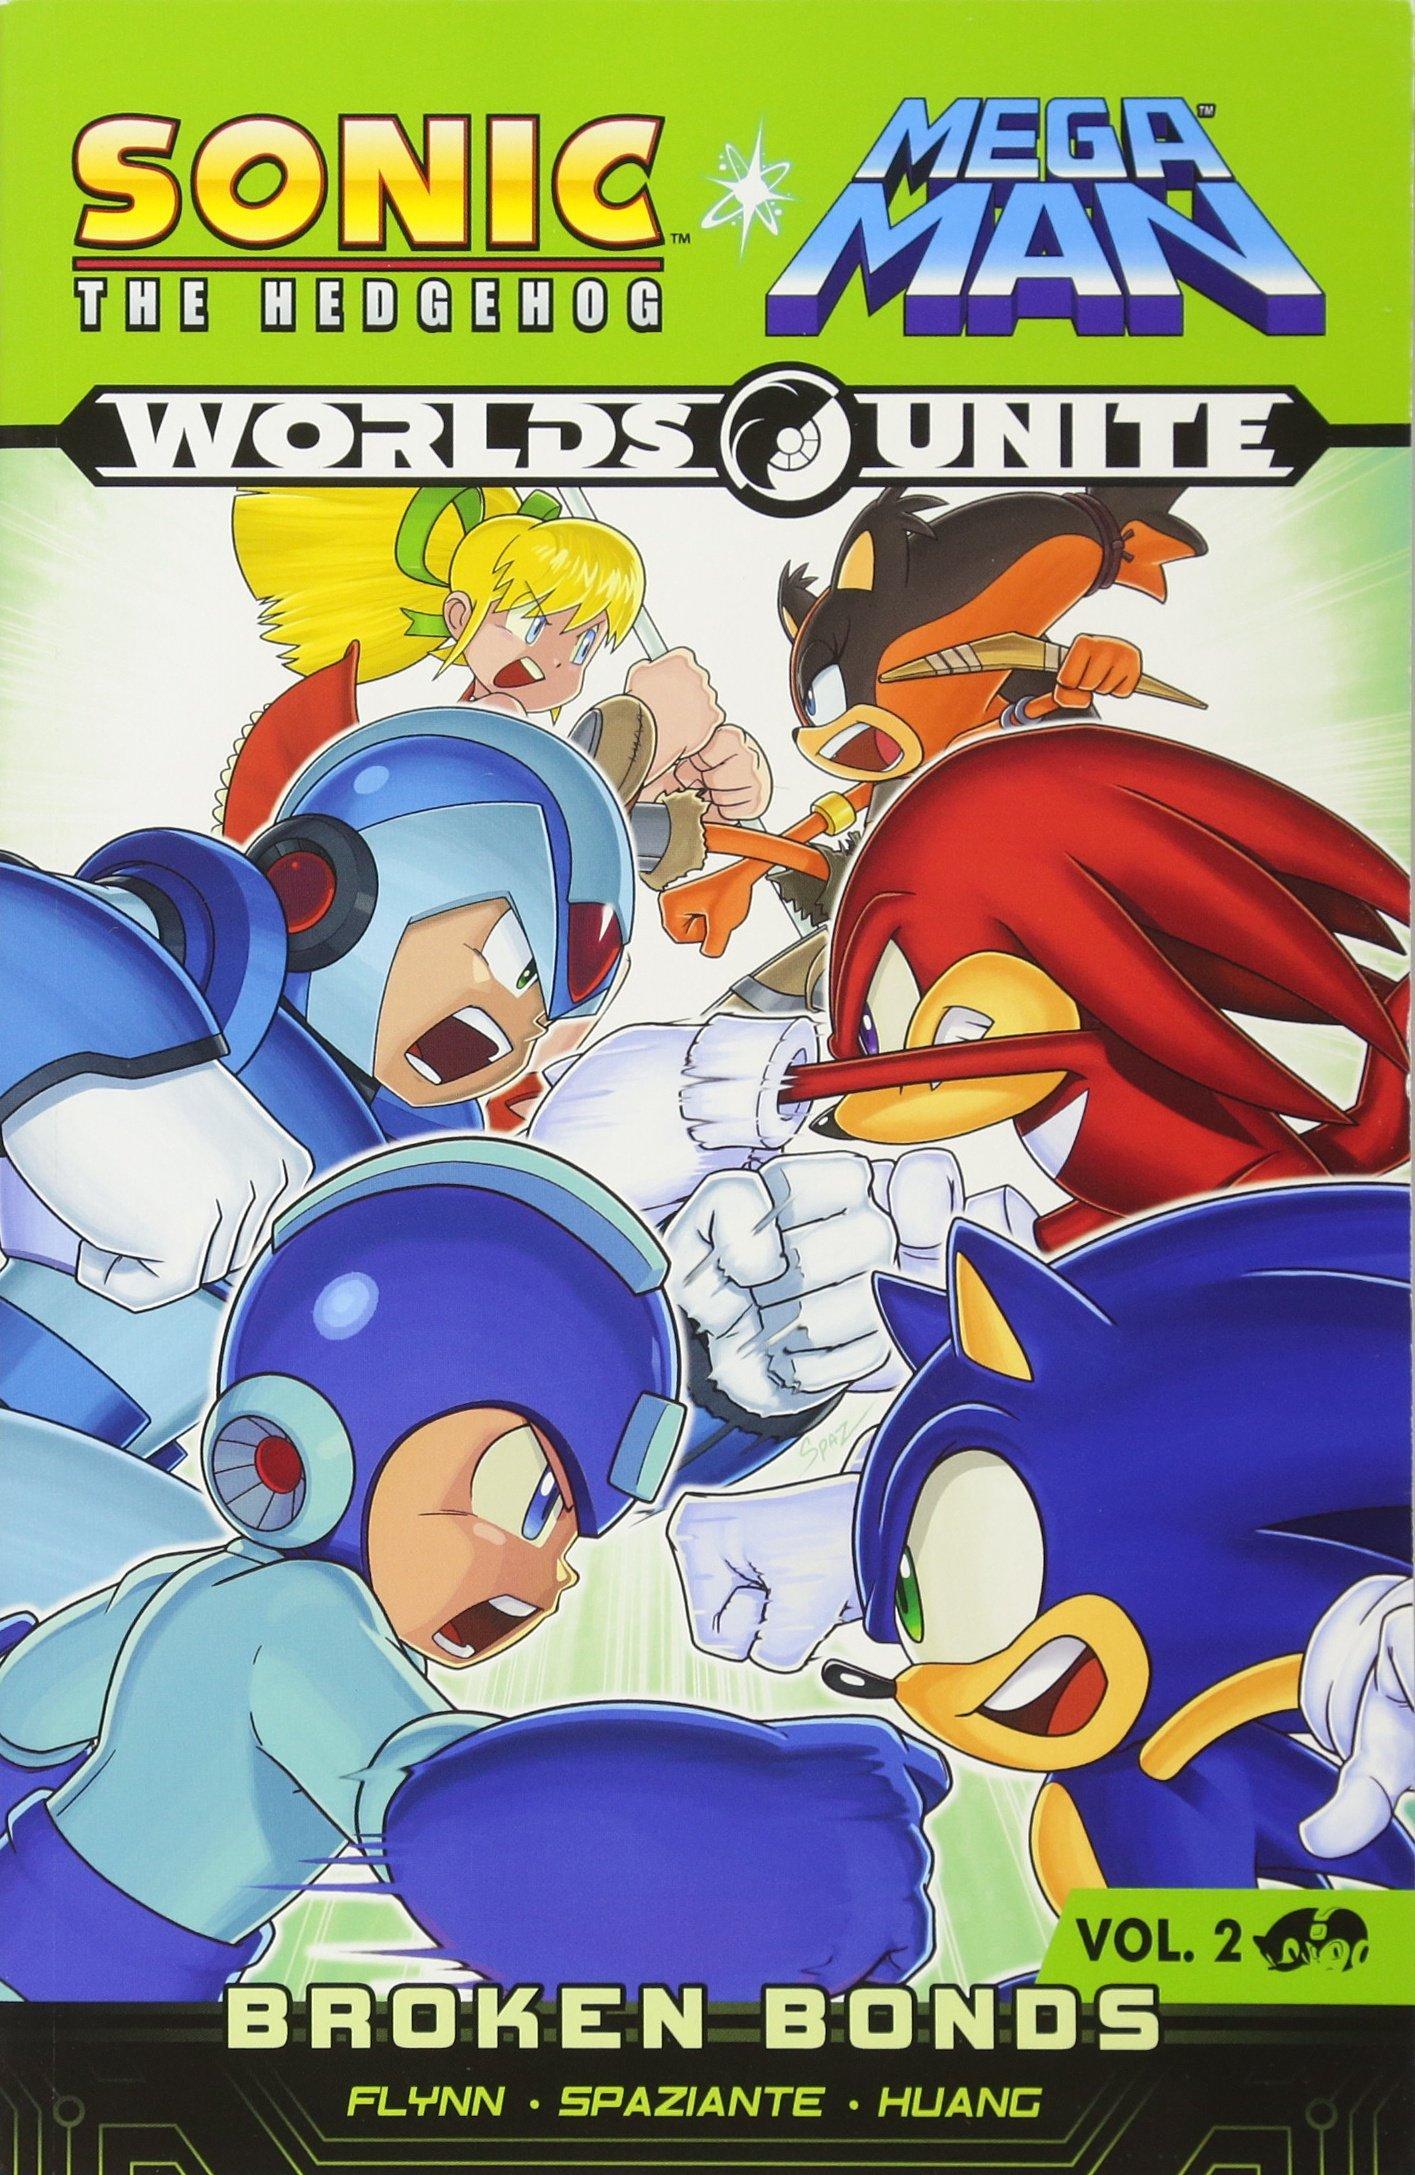 Amazon Com Sonic Mega Man Worlds Unite 2 9781627388689 Sonic Mega Man Scribes Books